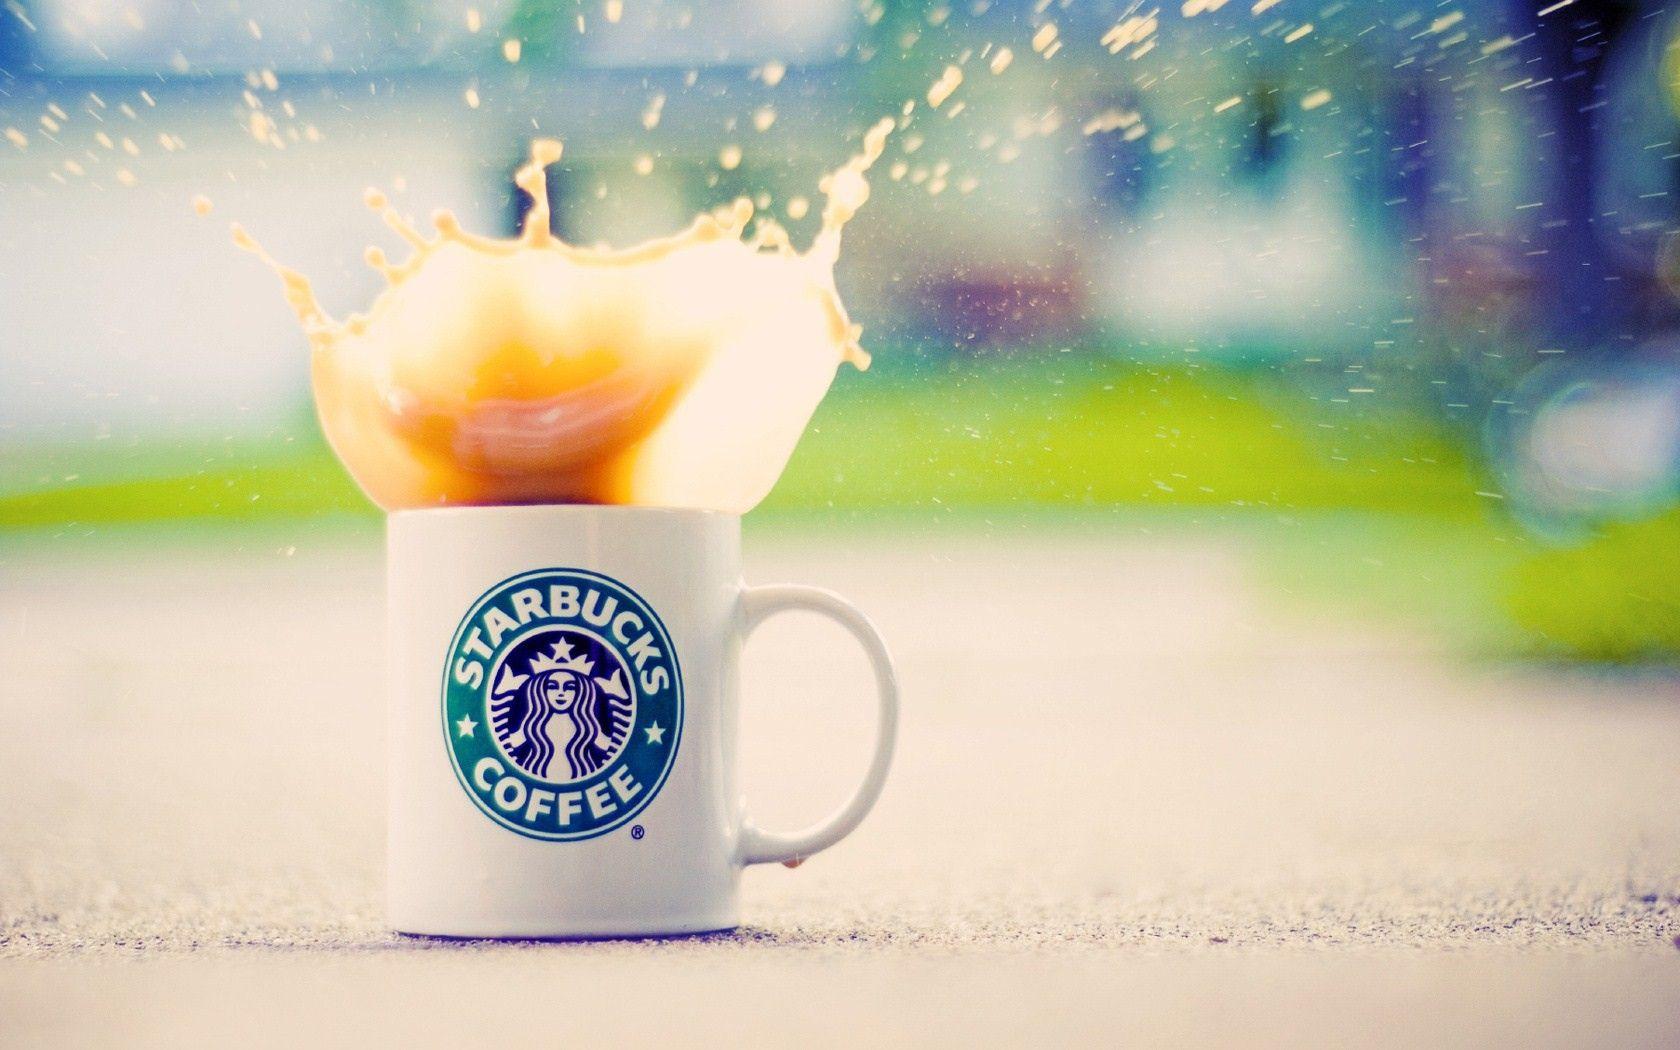 Hd wallpaper for whatsapp - Starbucks Coffee Cup Hd Wallpaper Whatsapp And Facebook